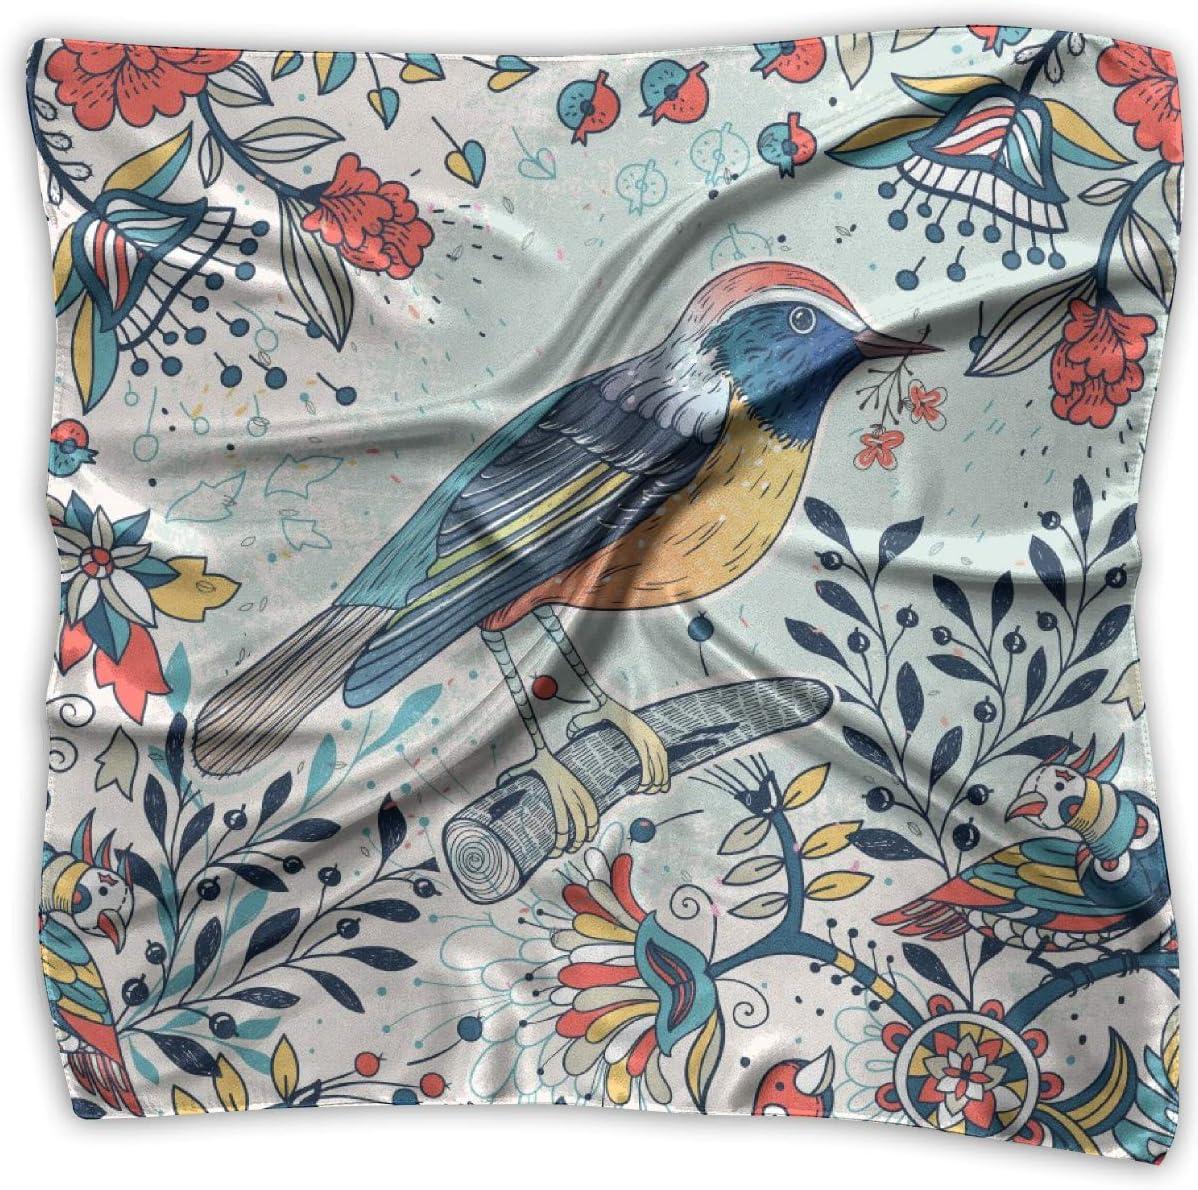 YANGZXC Vintage Colorful Birds Flowers Art Handkerchief Polyester Pocket Square Mulipurpose Silk Bandanas Delicate Printing